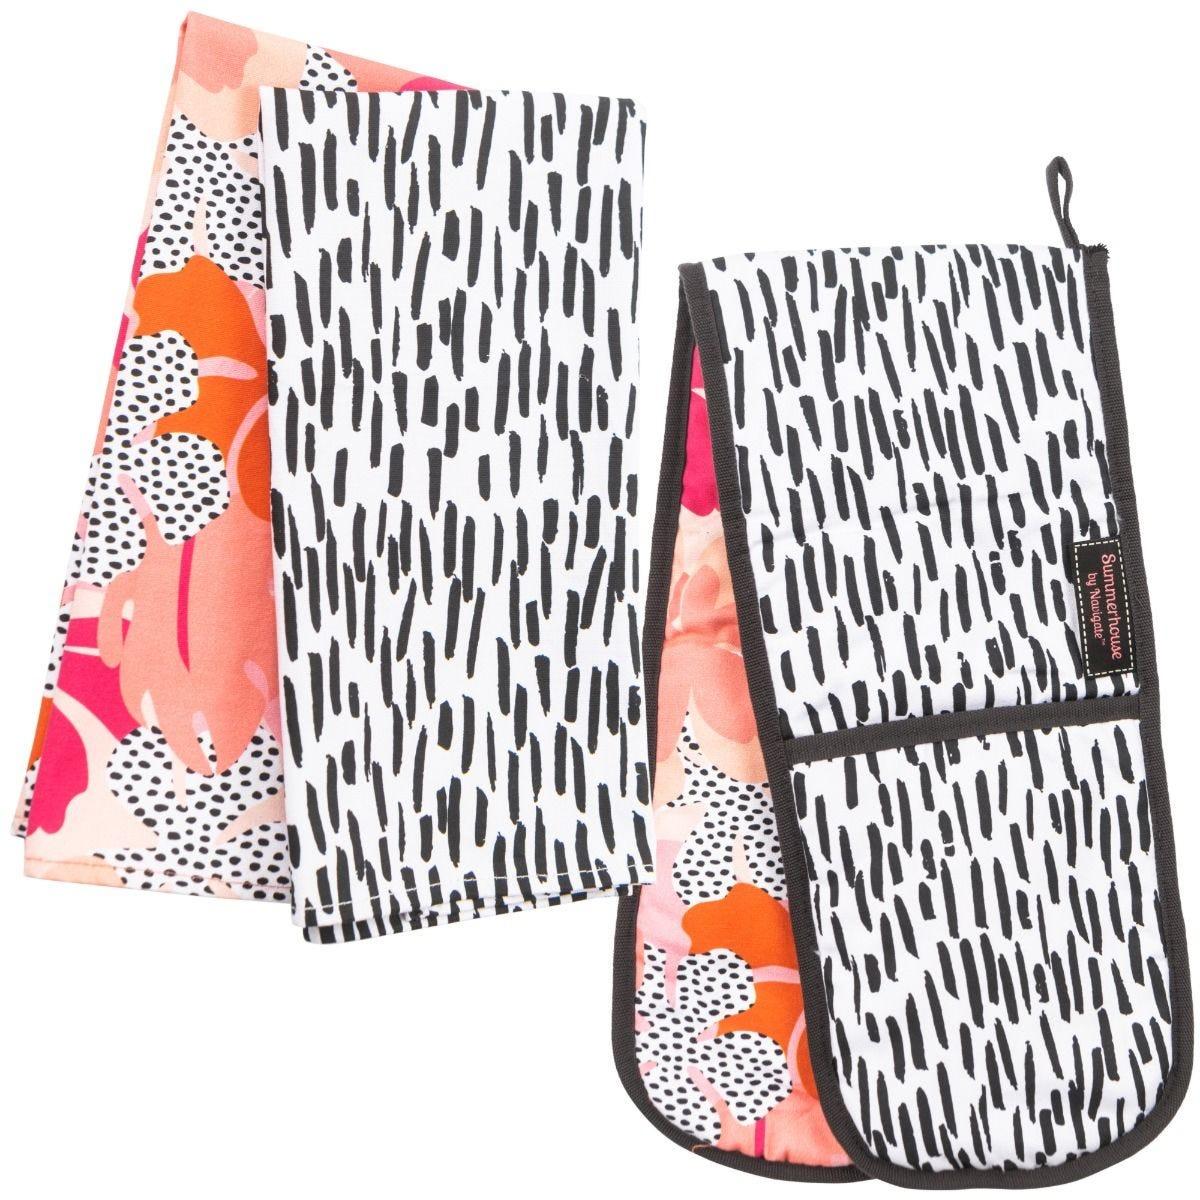 Summerhouse Tribal Fusion Oven Gloves & Set of 2 Tea Towels